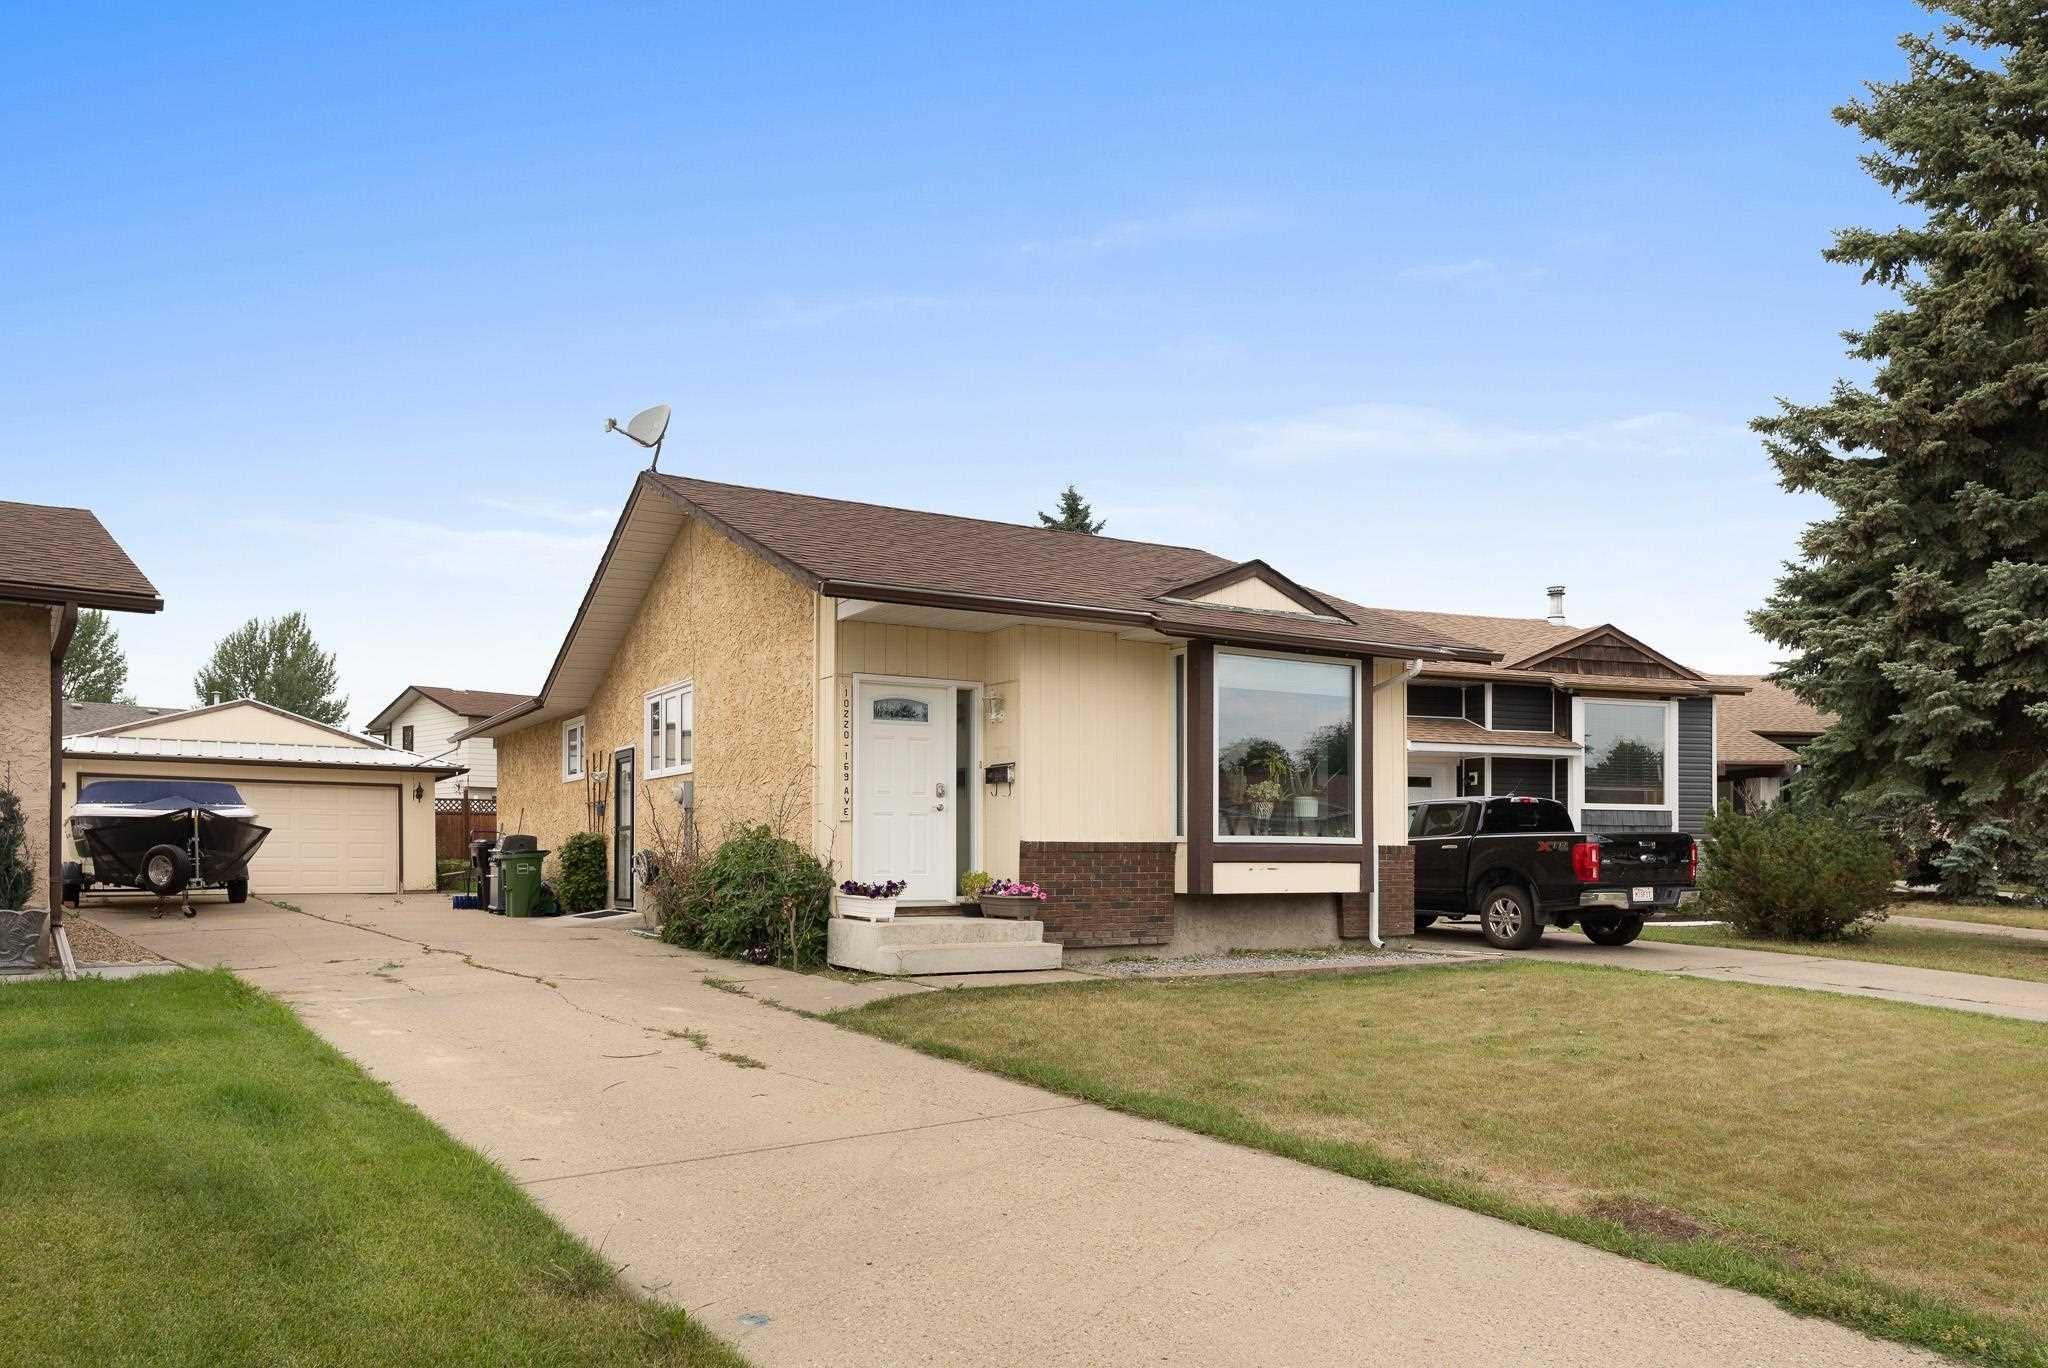 Main Photo: 10220 169 Avenue in Edmonton: Zone 27 House for sale : MLS®# E4266336